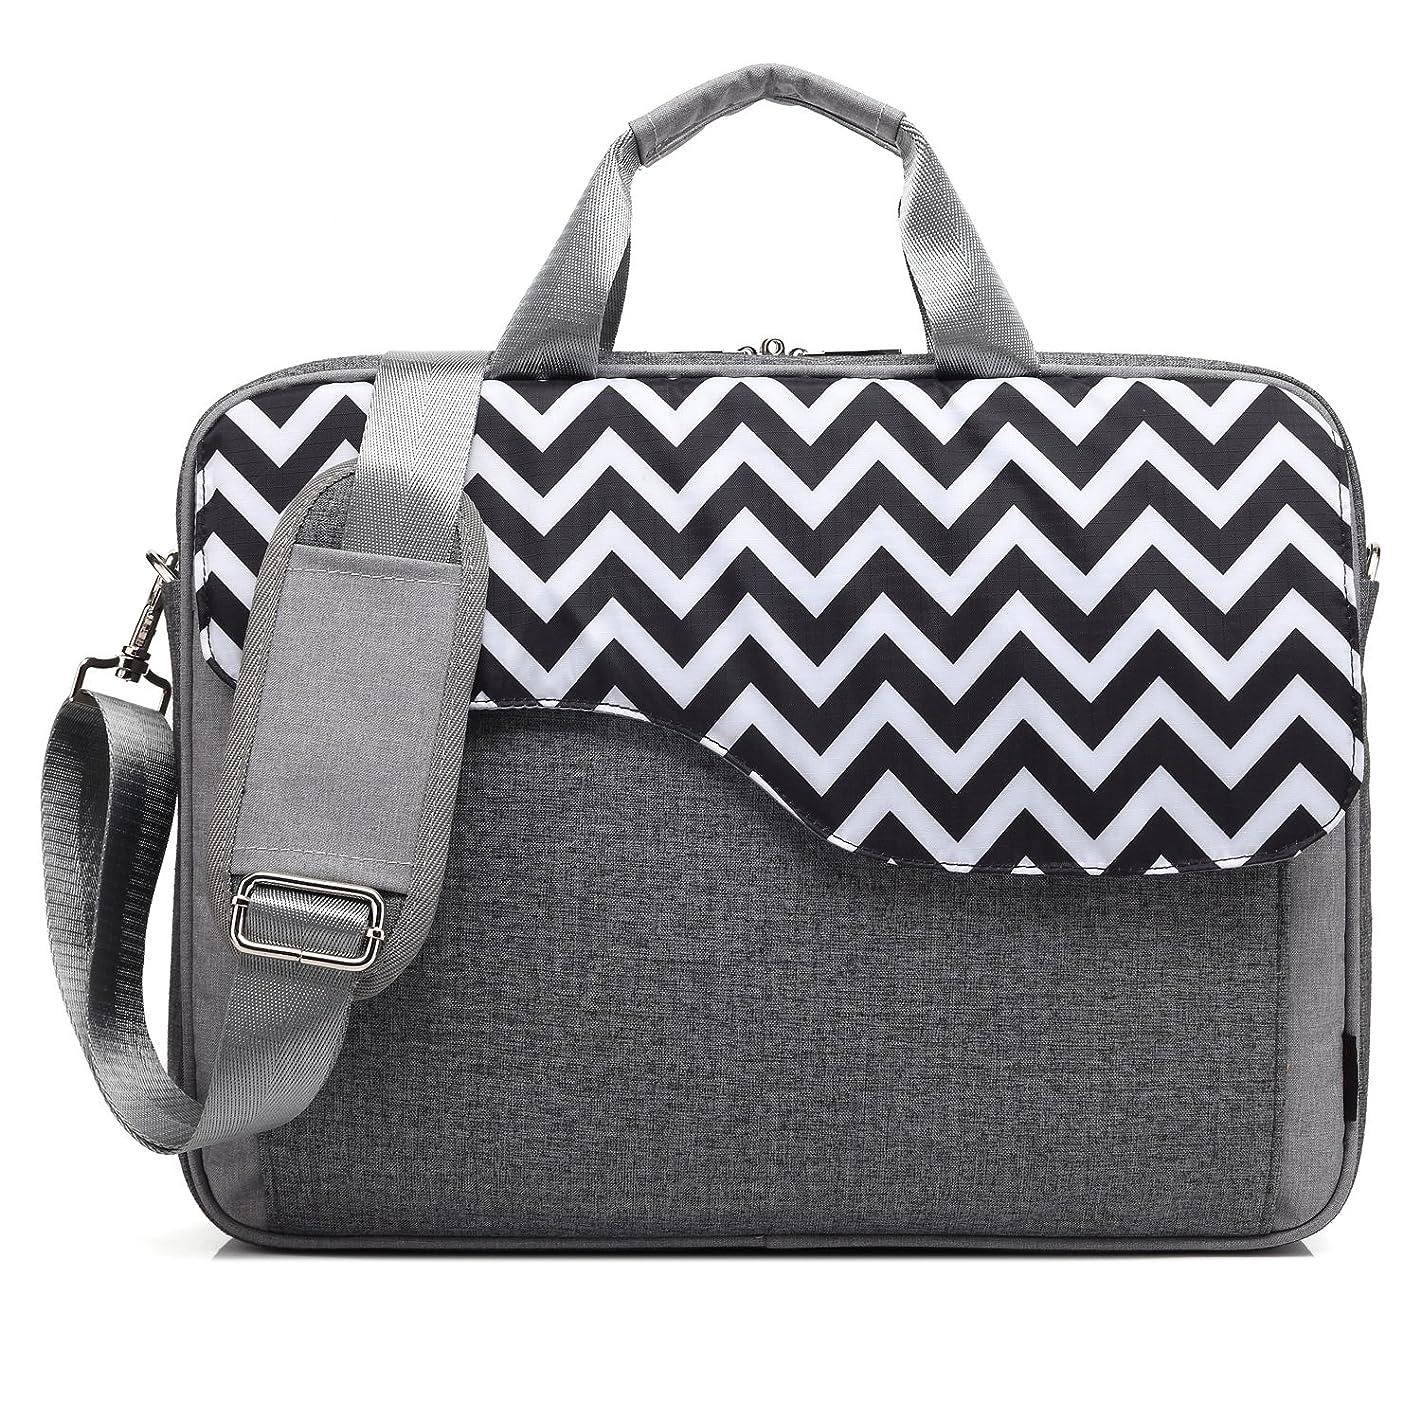 CoolBELL 15.6 Inch Nylon Laptop Bag Shoulder Bag with Strap Multicompartment Messenger Hand Bag Tablet Briefcase for iPad Pro/Laptop / MacBook/Ultrabook / Men/Women / College (Grey Wave)